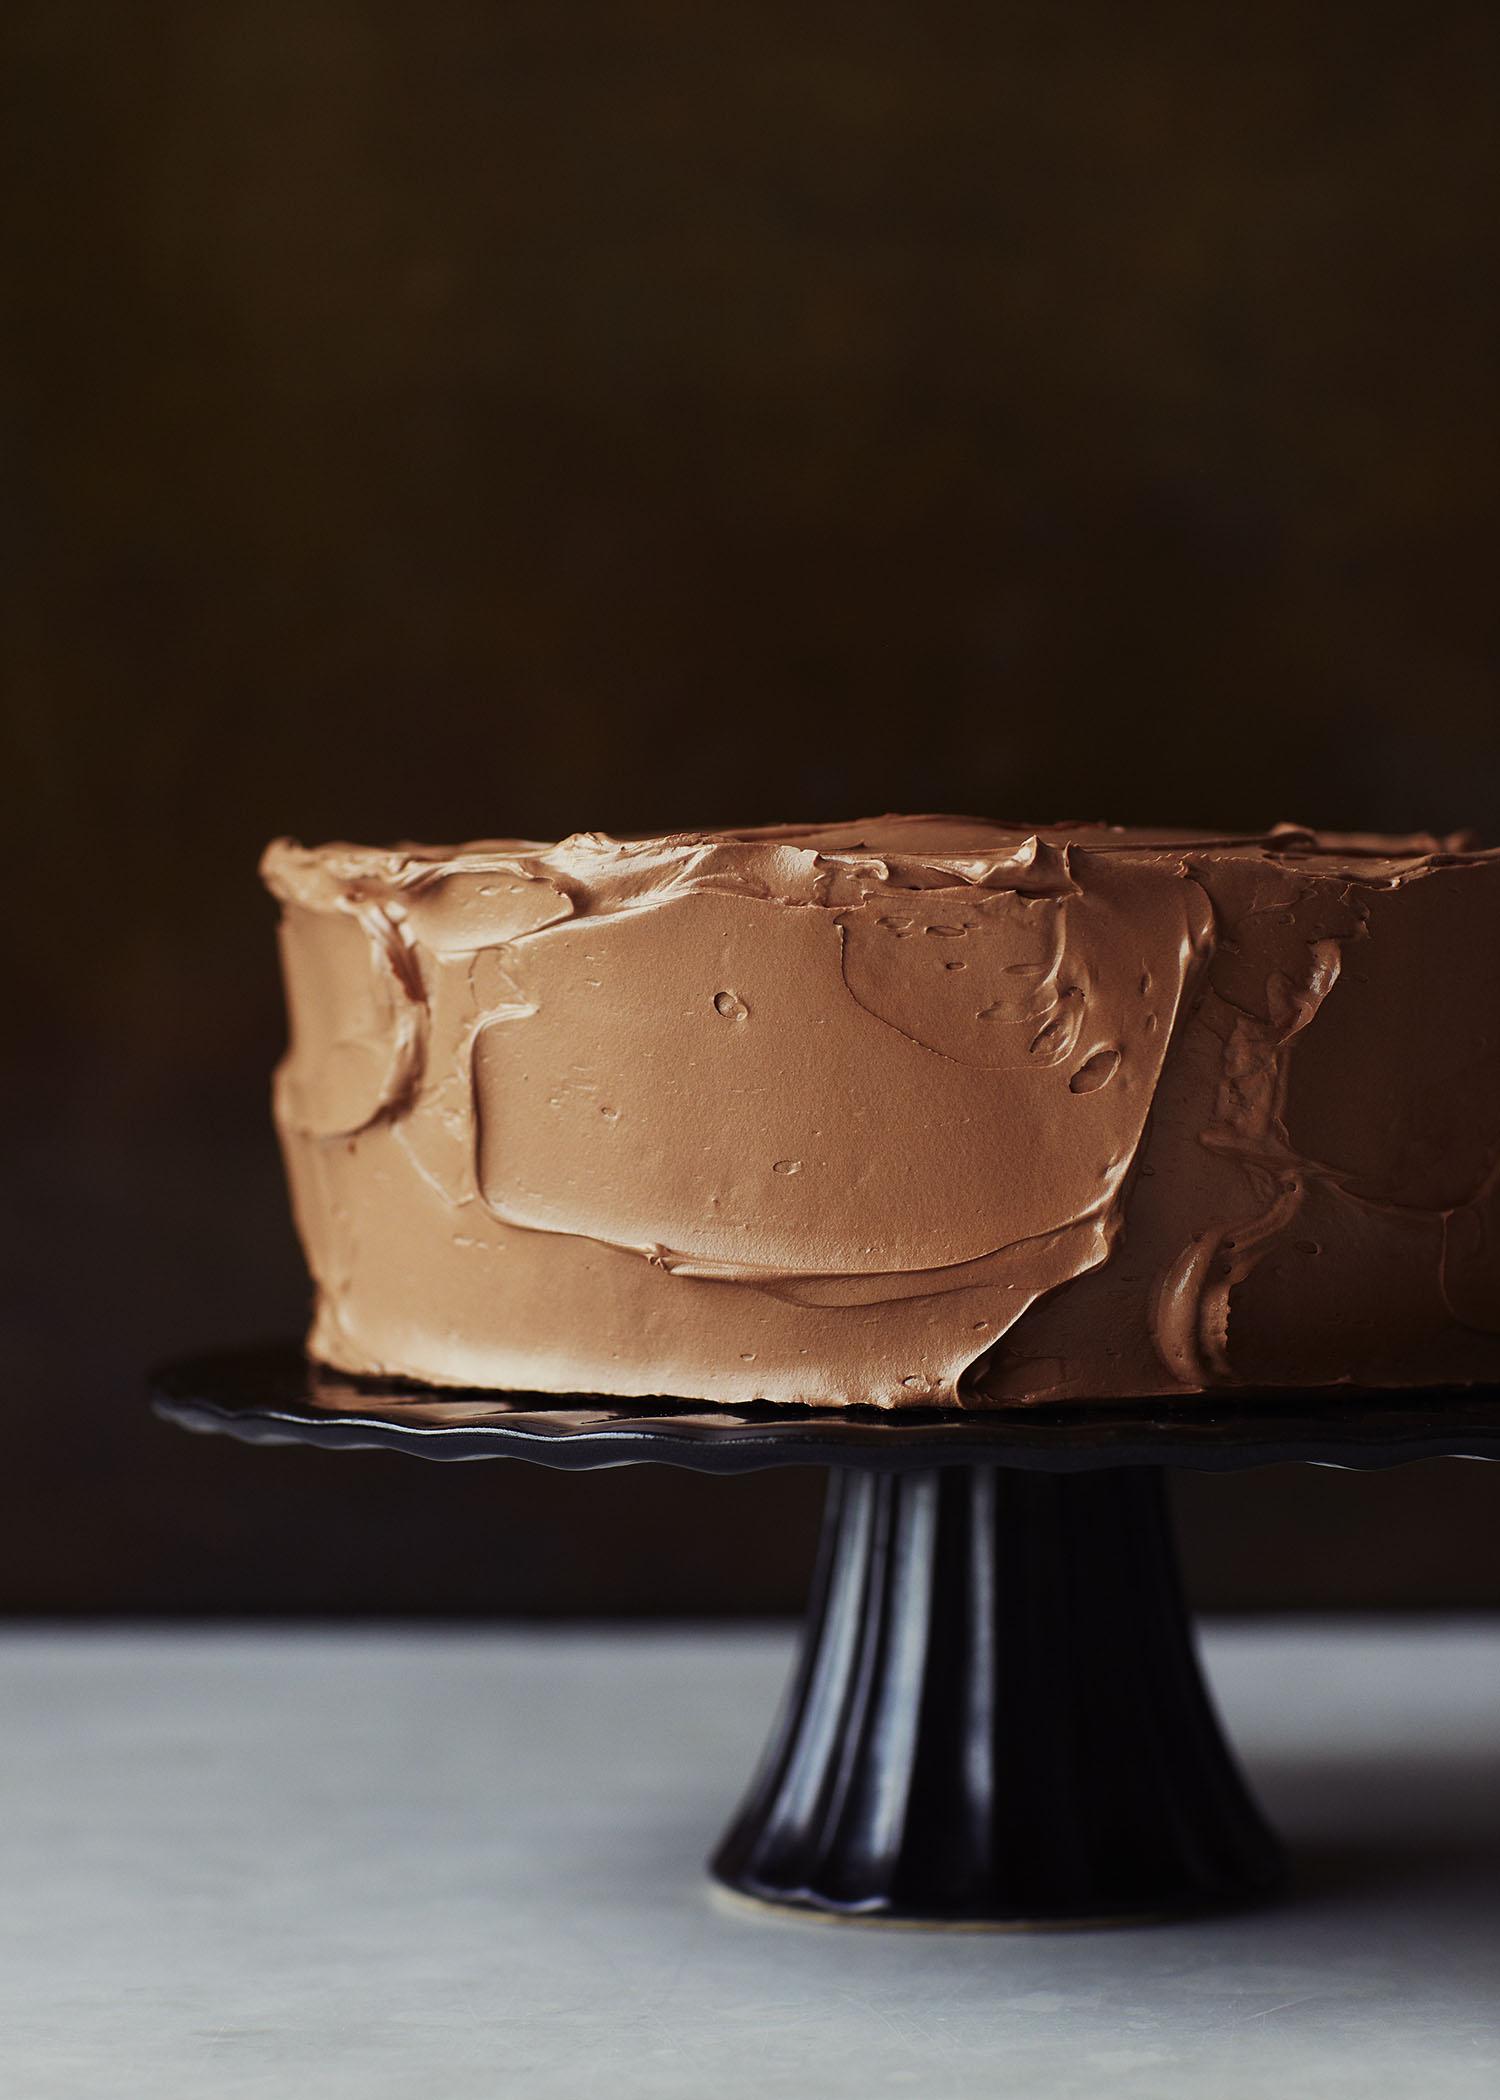 devils-cake-beauty-347-d112204Y.jpg